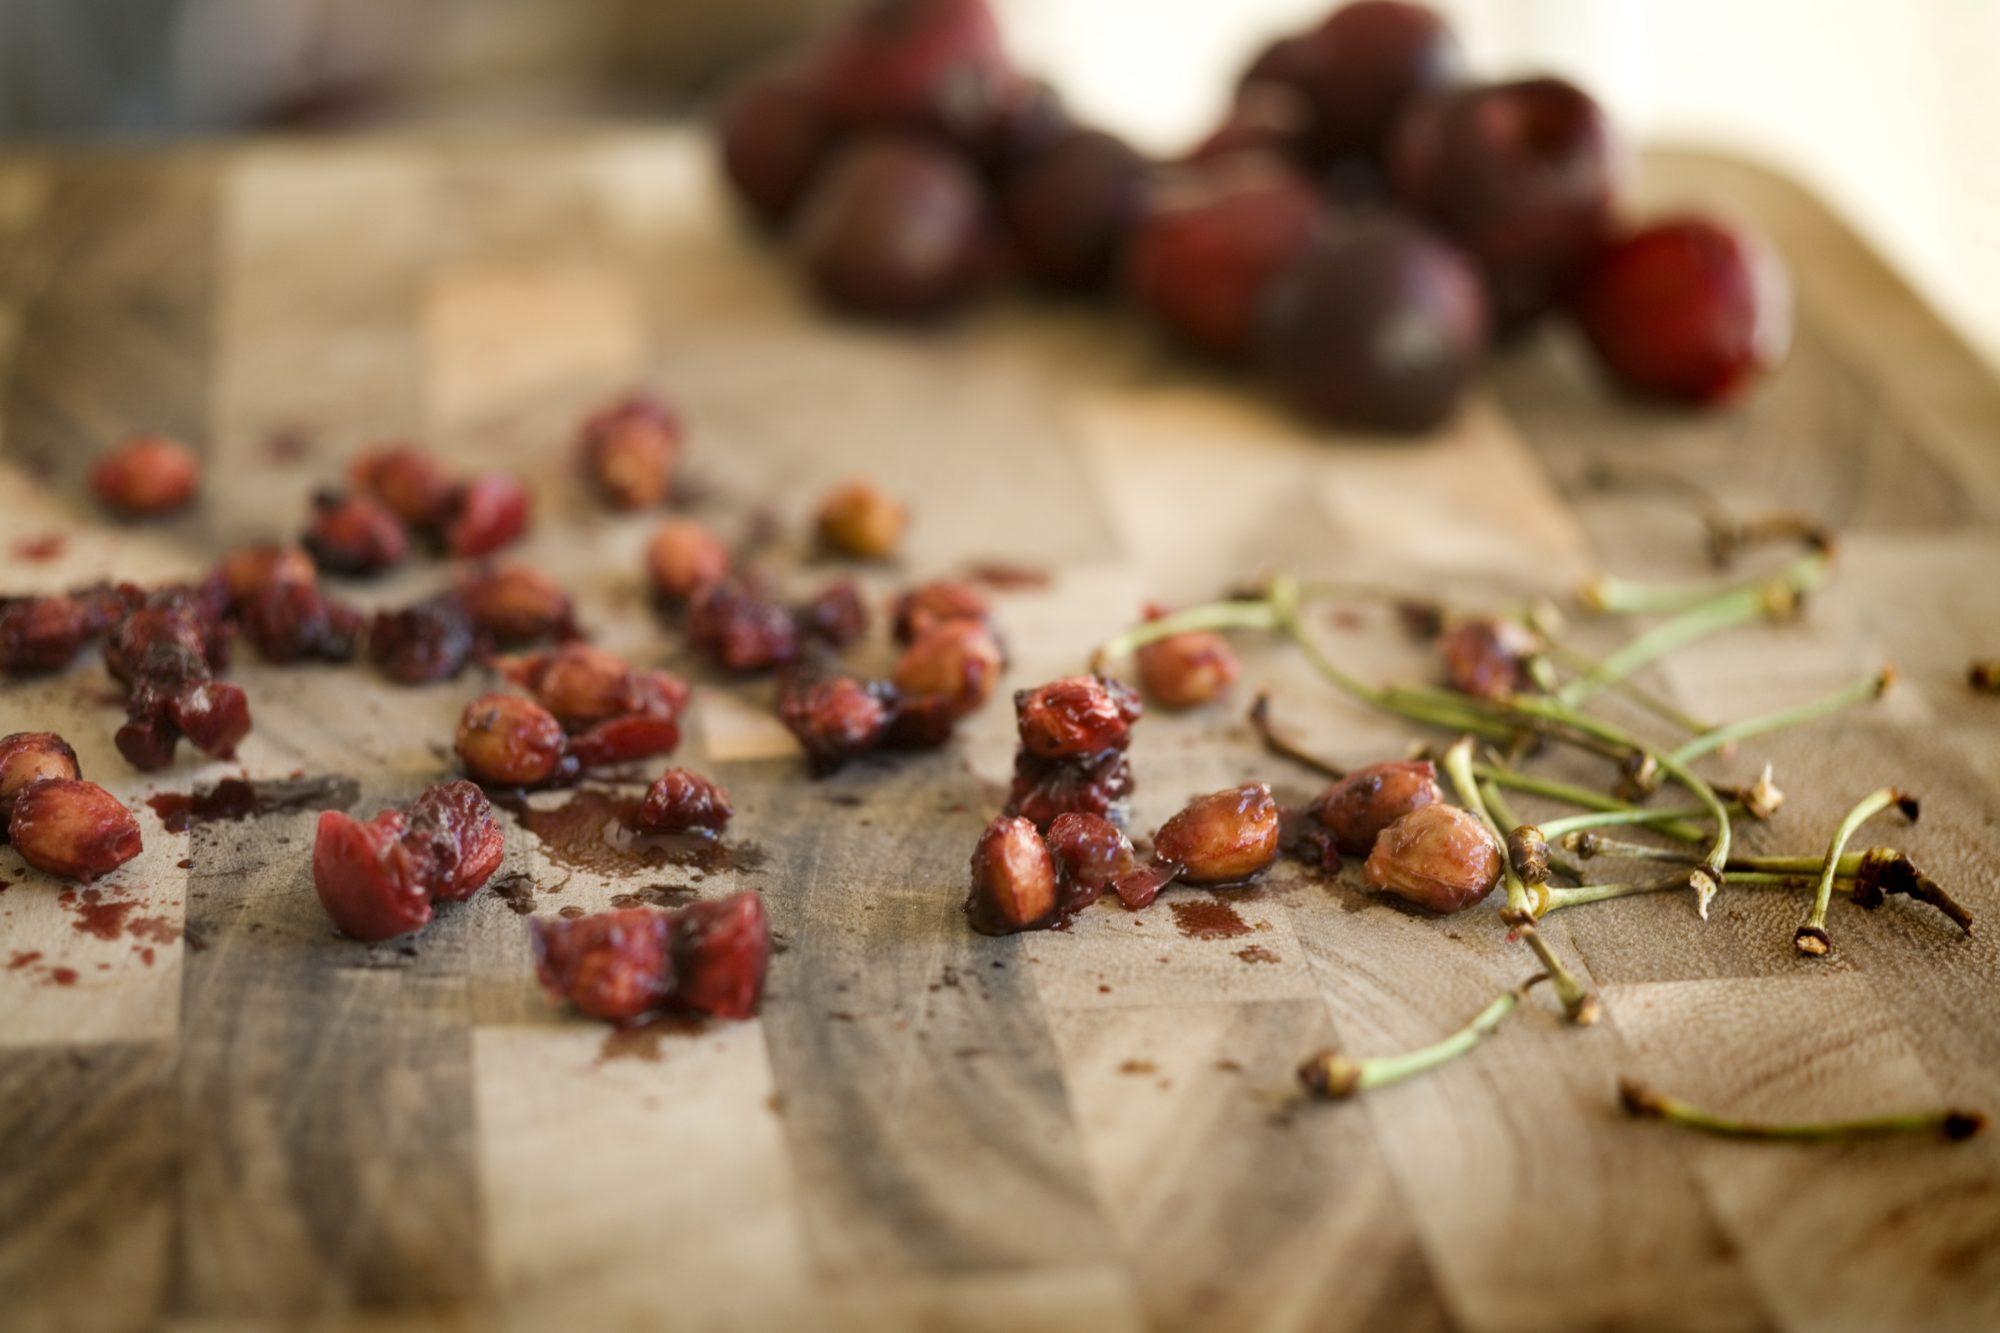 Cherry Pits